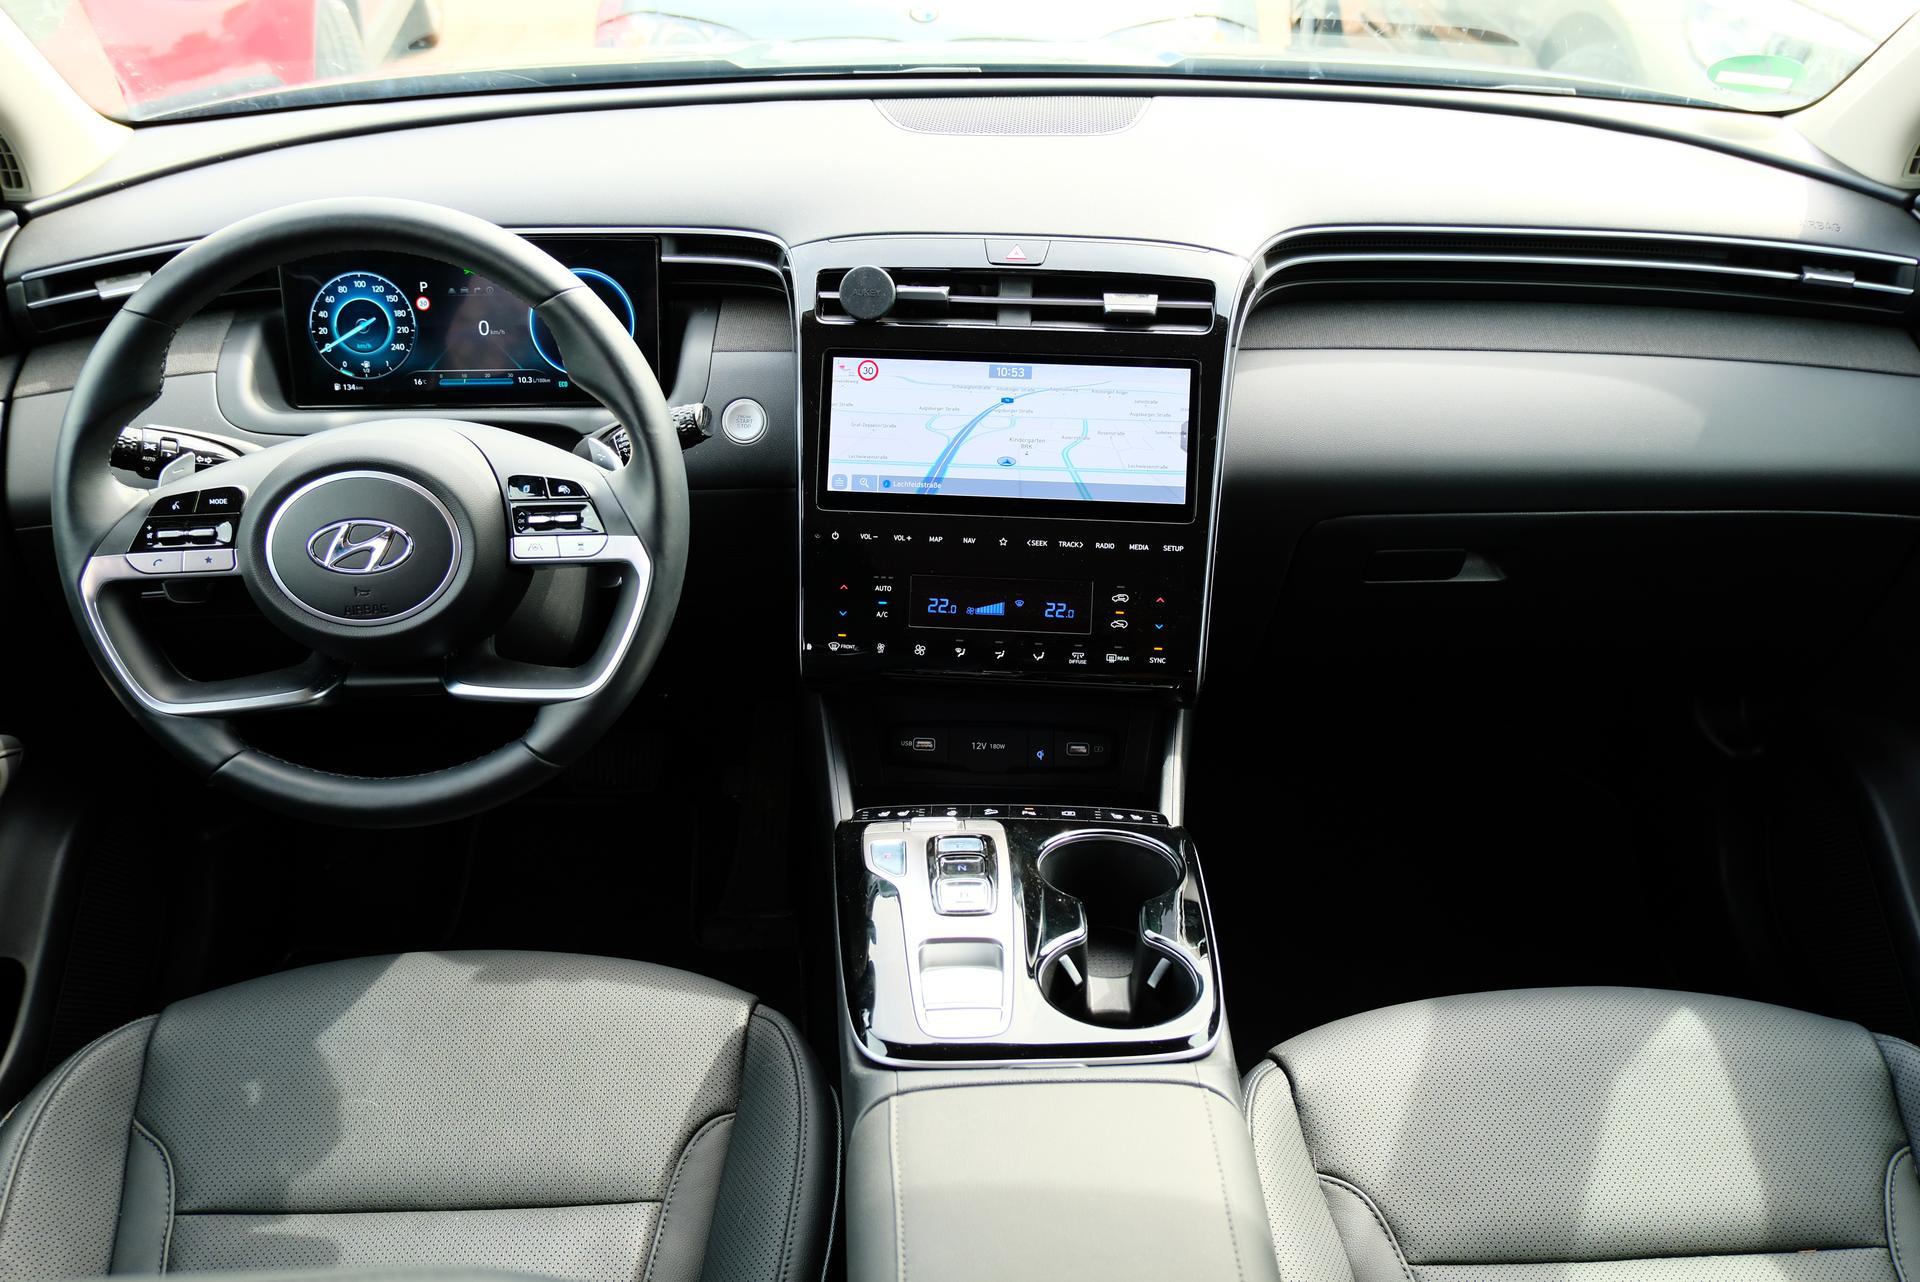 Hyundai Tucson 1.6 T-GDI HEV 4x4 Innenraum Highlights